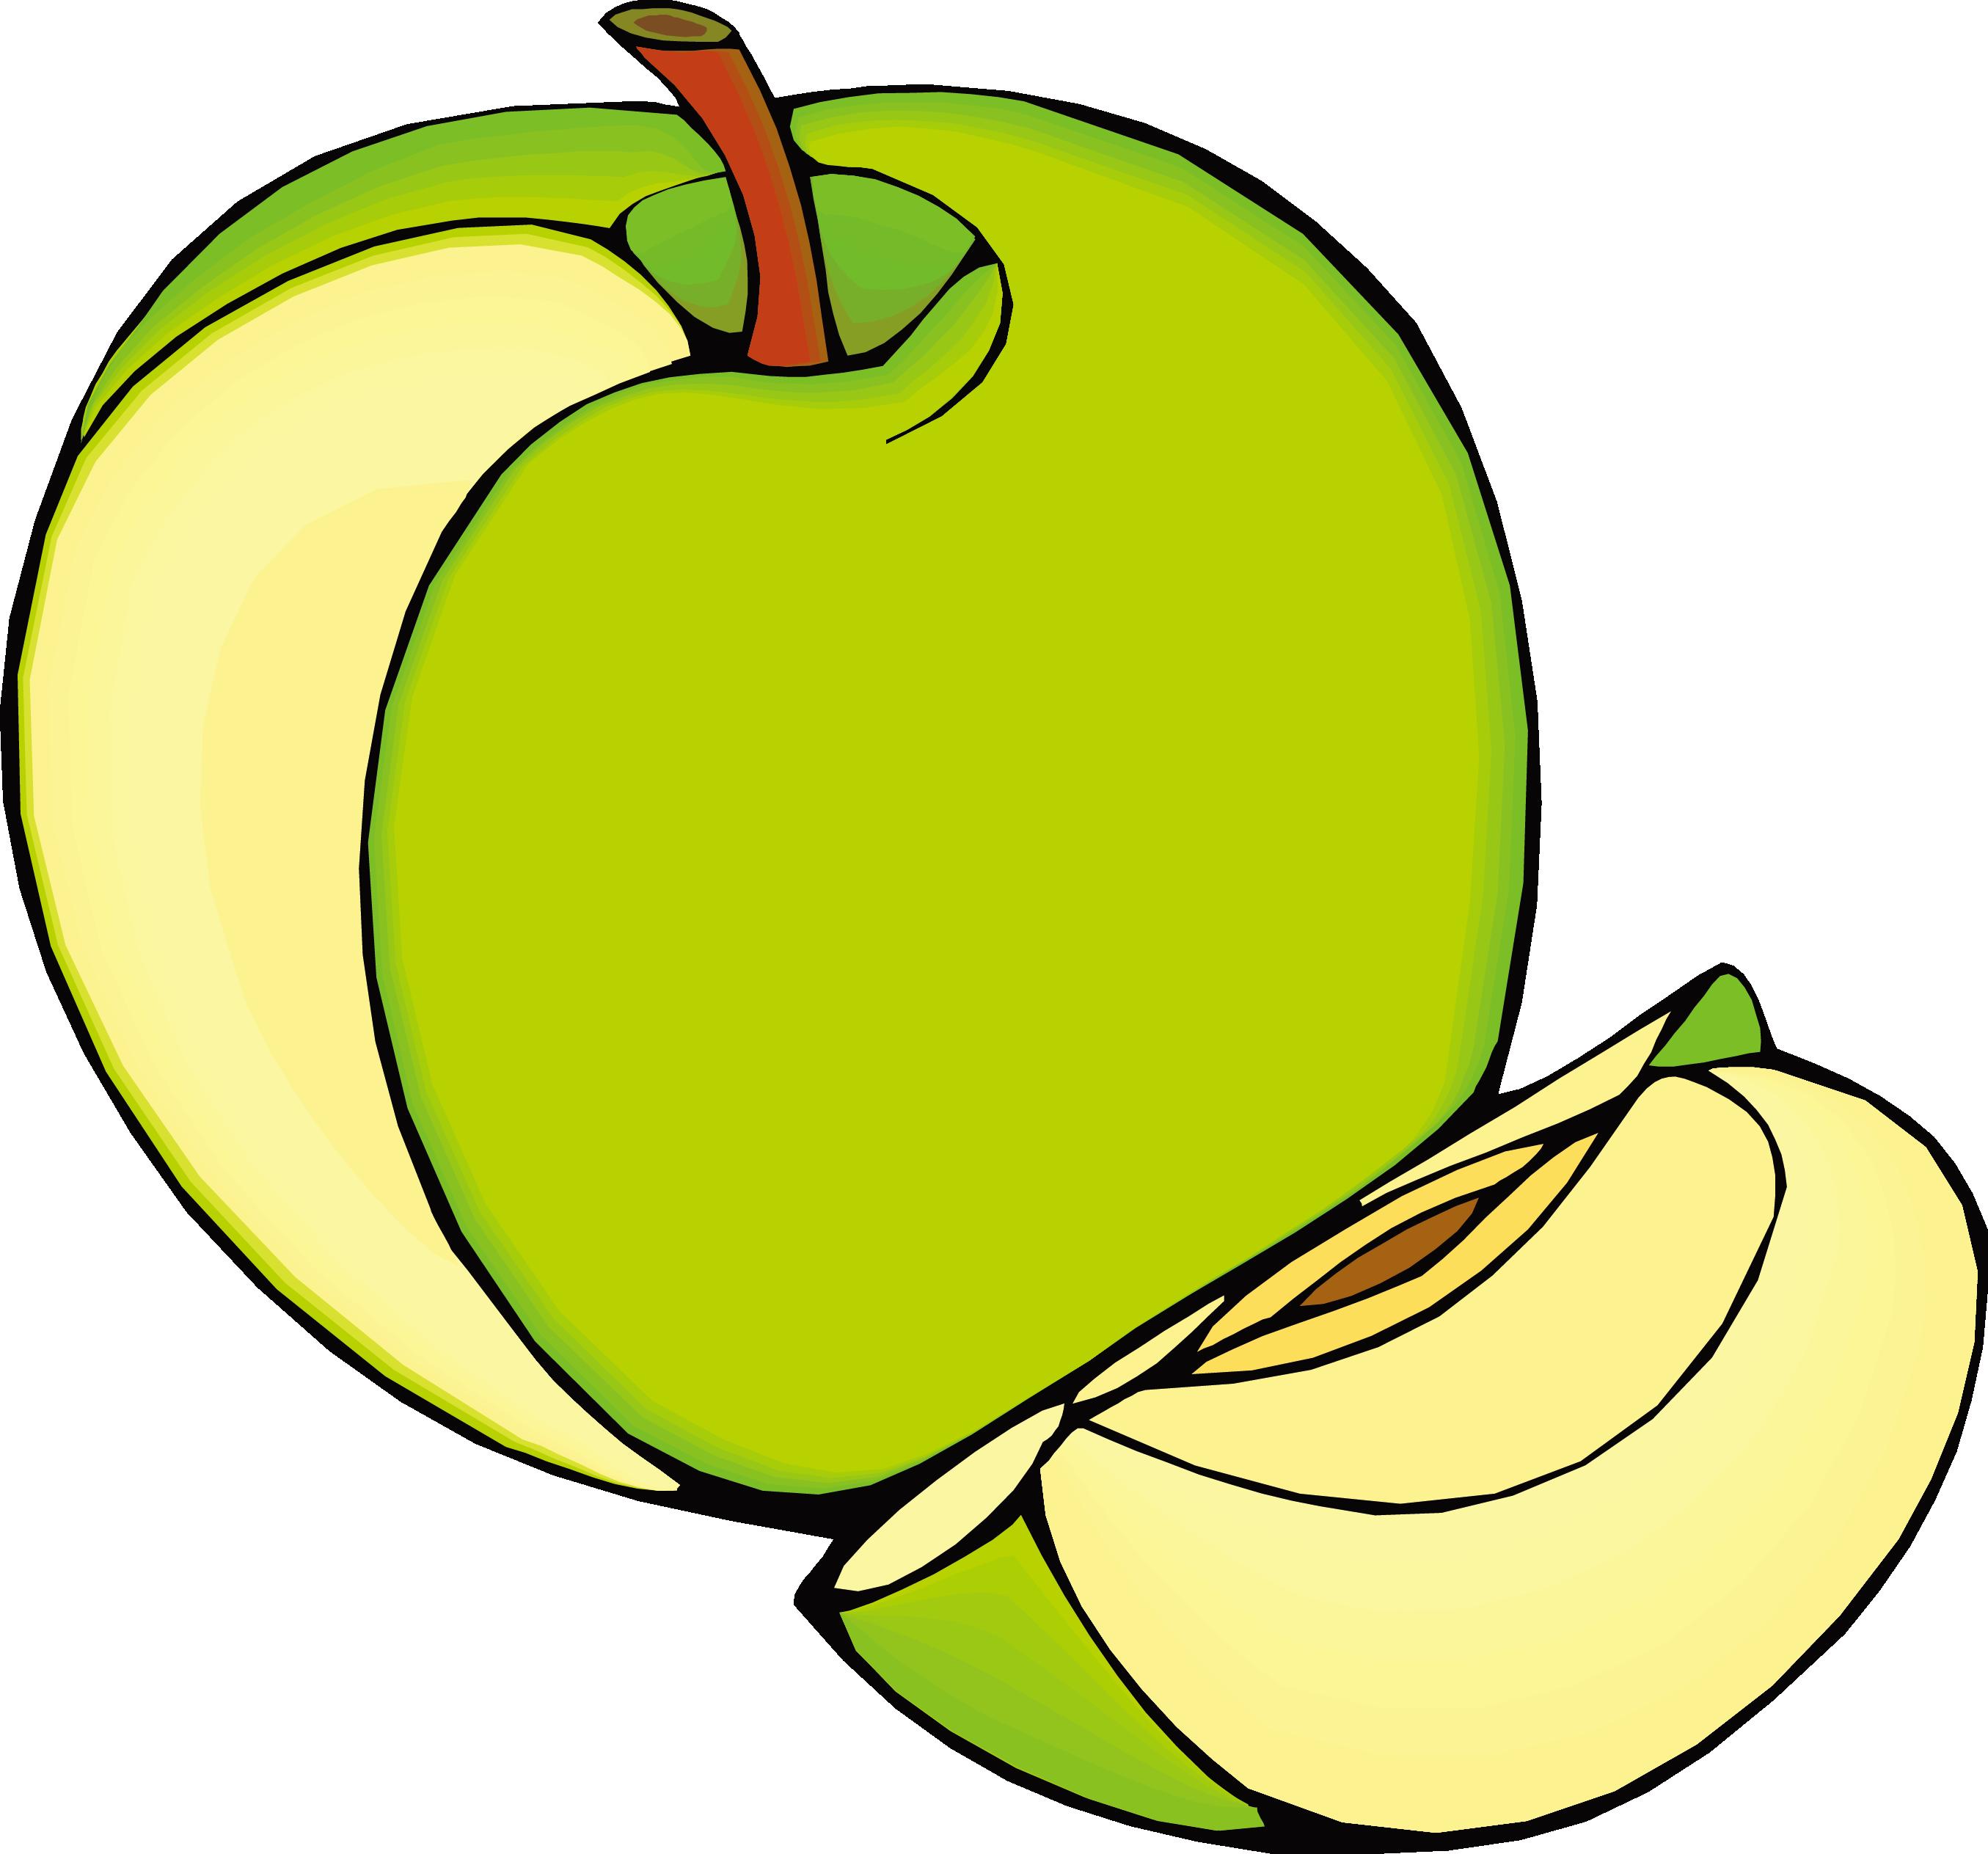 Free clipart green apple image freeuse Fruits et lxe9gumes Vegetable Clip art - Green Apple 2710*2527 ... image freeuse